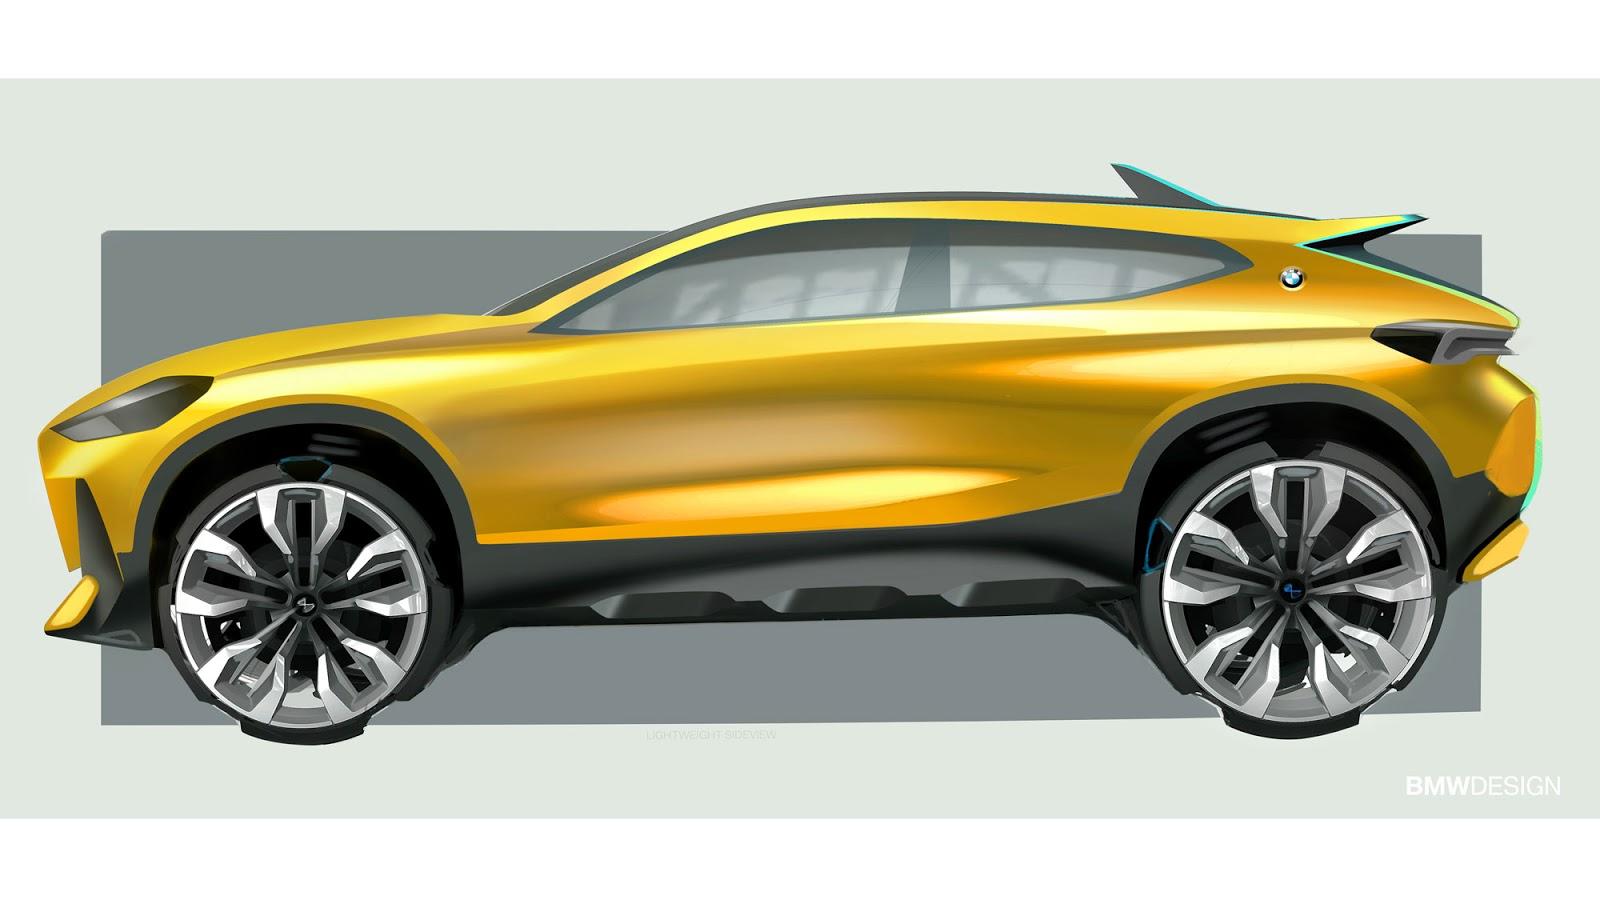 BMW X2 sketch by Sebastian Simm - profile view in yellow